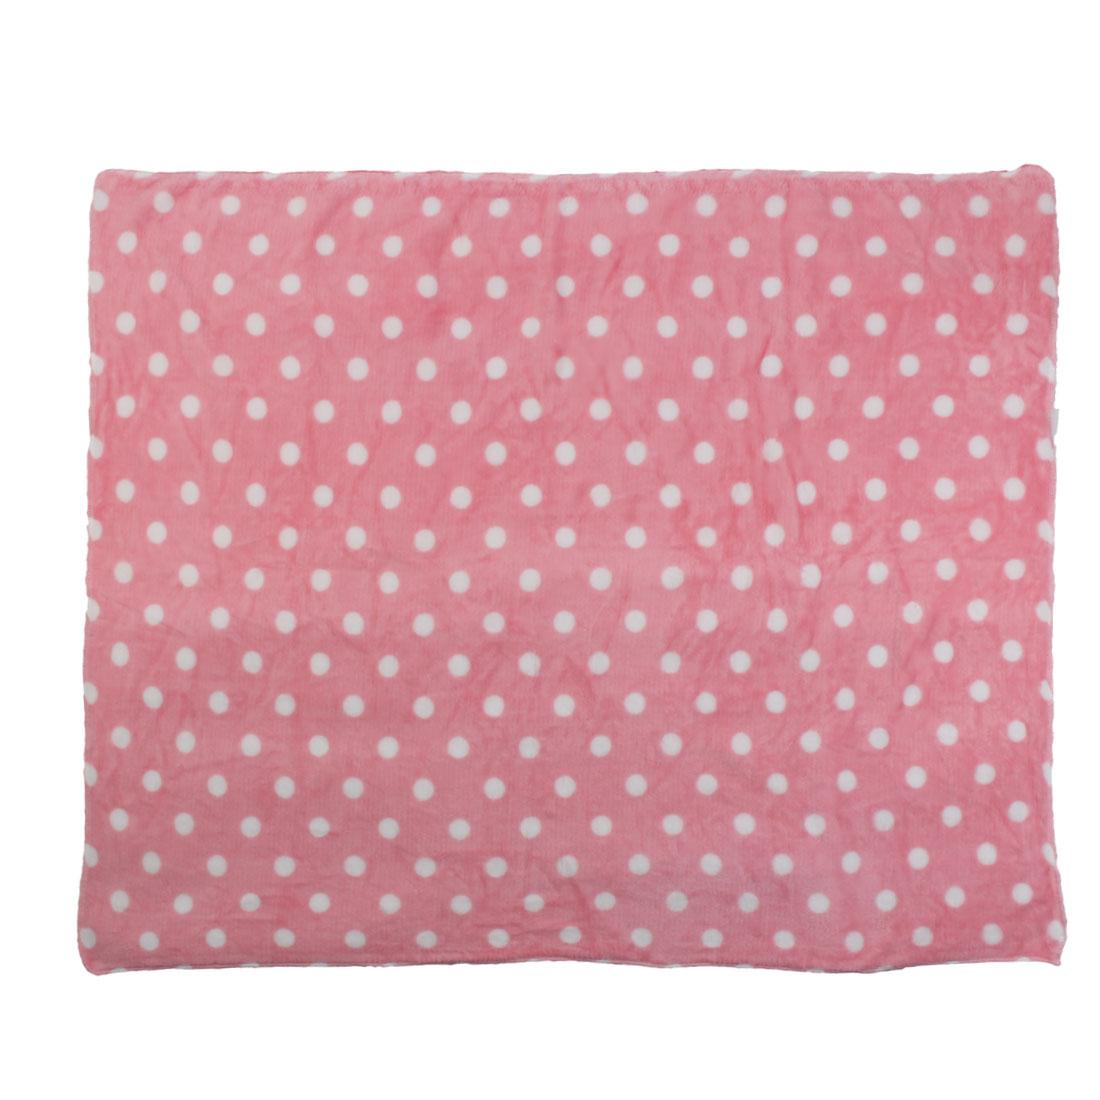 Pet Flannel Dot Pattern Cat Bed Cushion Soft Sleeping Mat Dog Blanket Pink White